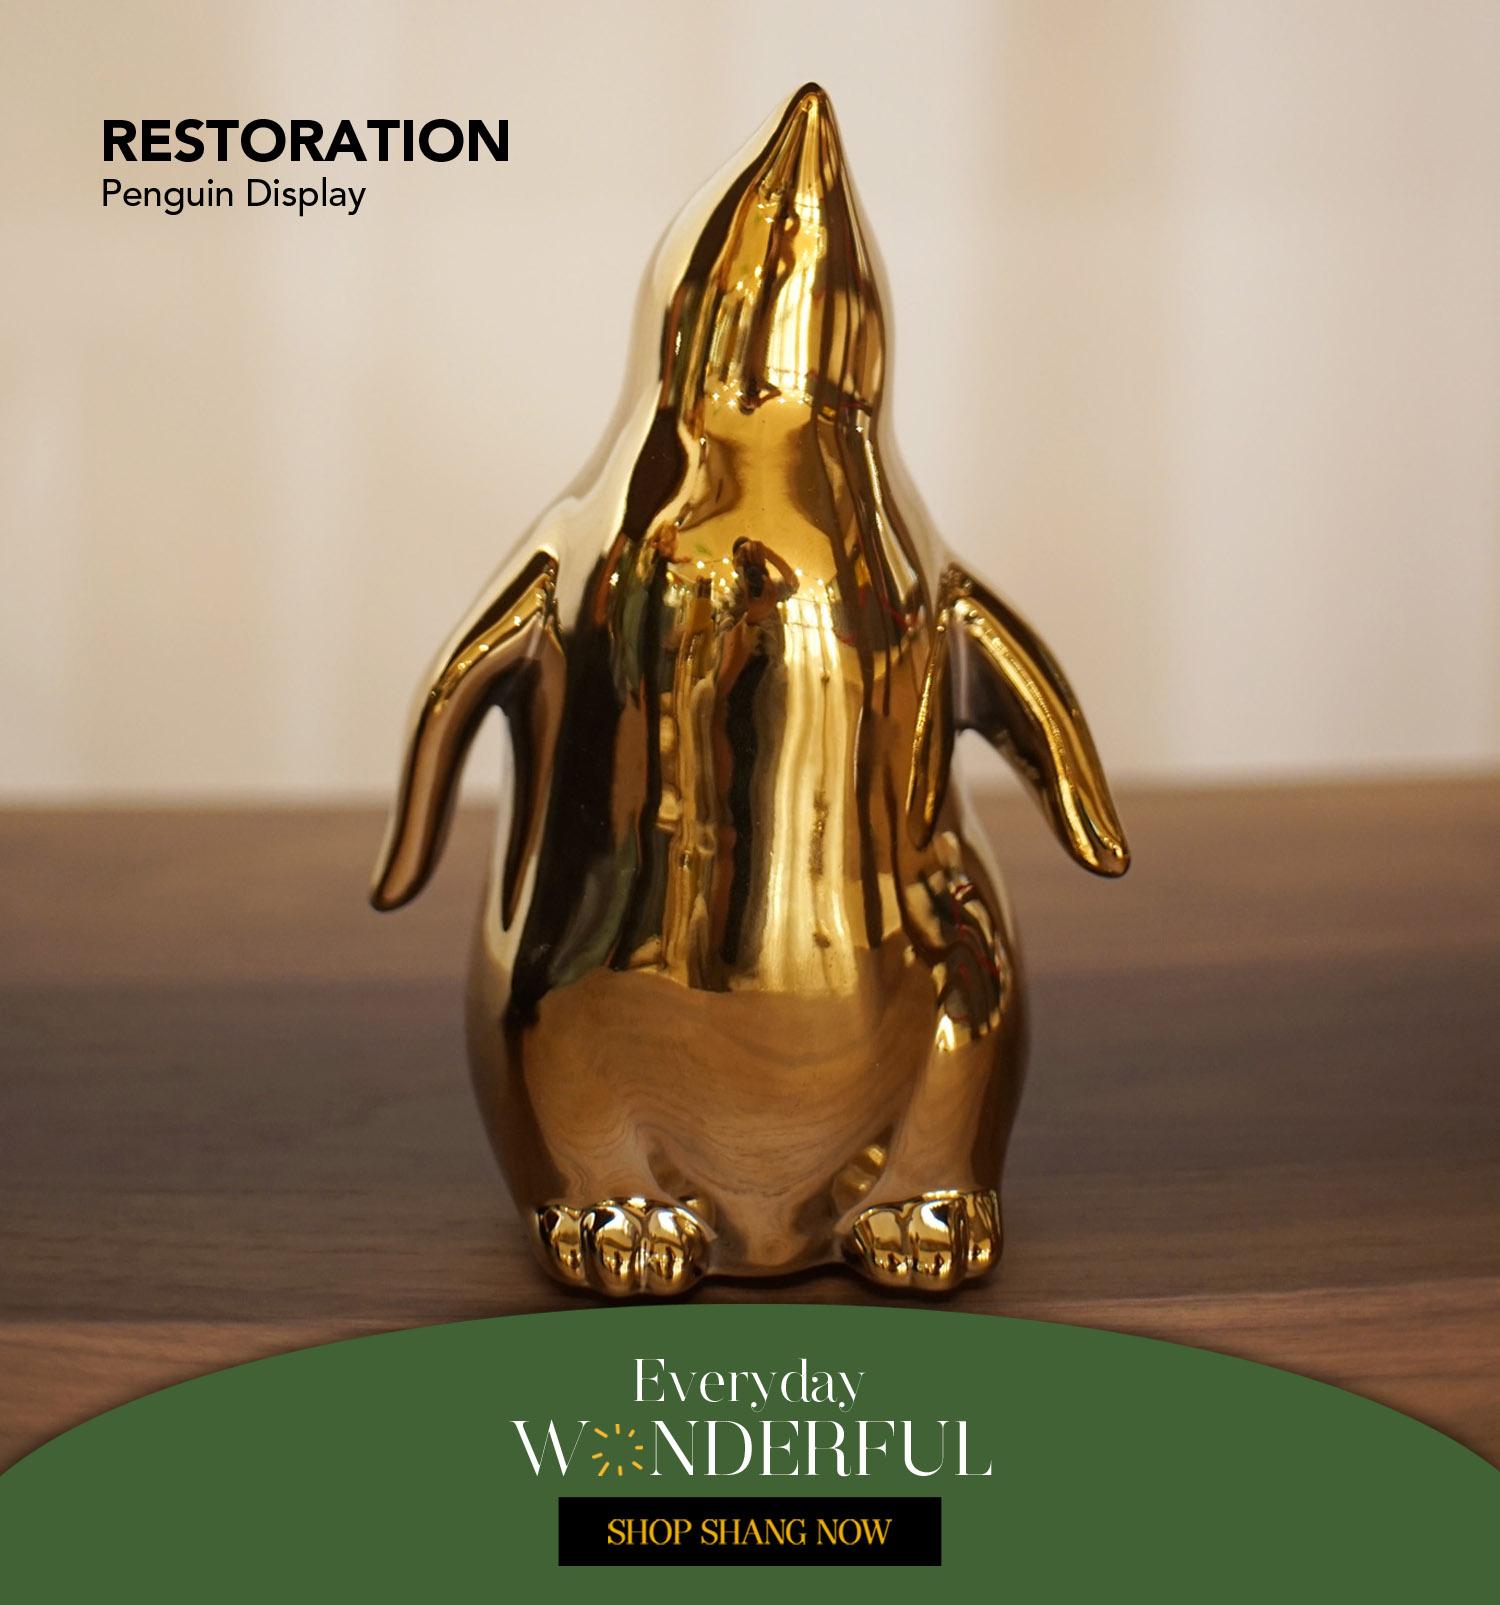 Penguin Display from Restoration